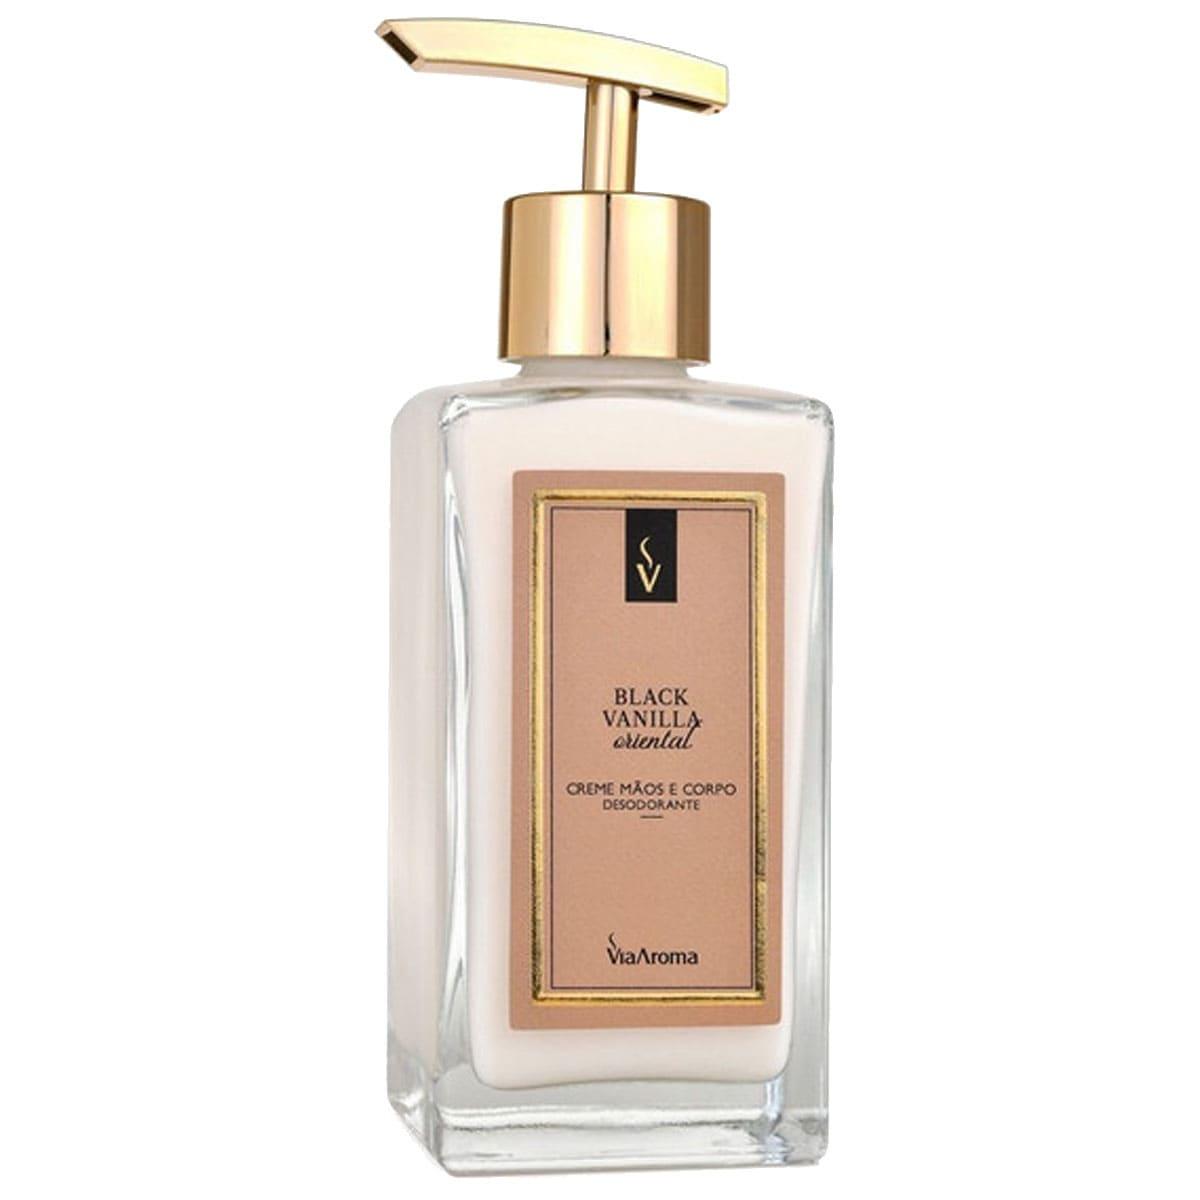 Creme hidratante desodorante para mãos e corpo black vanilla 250ml